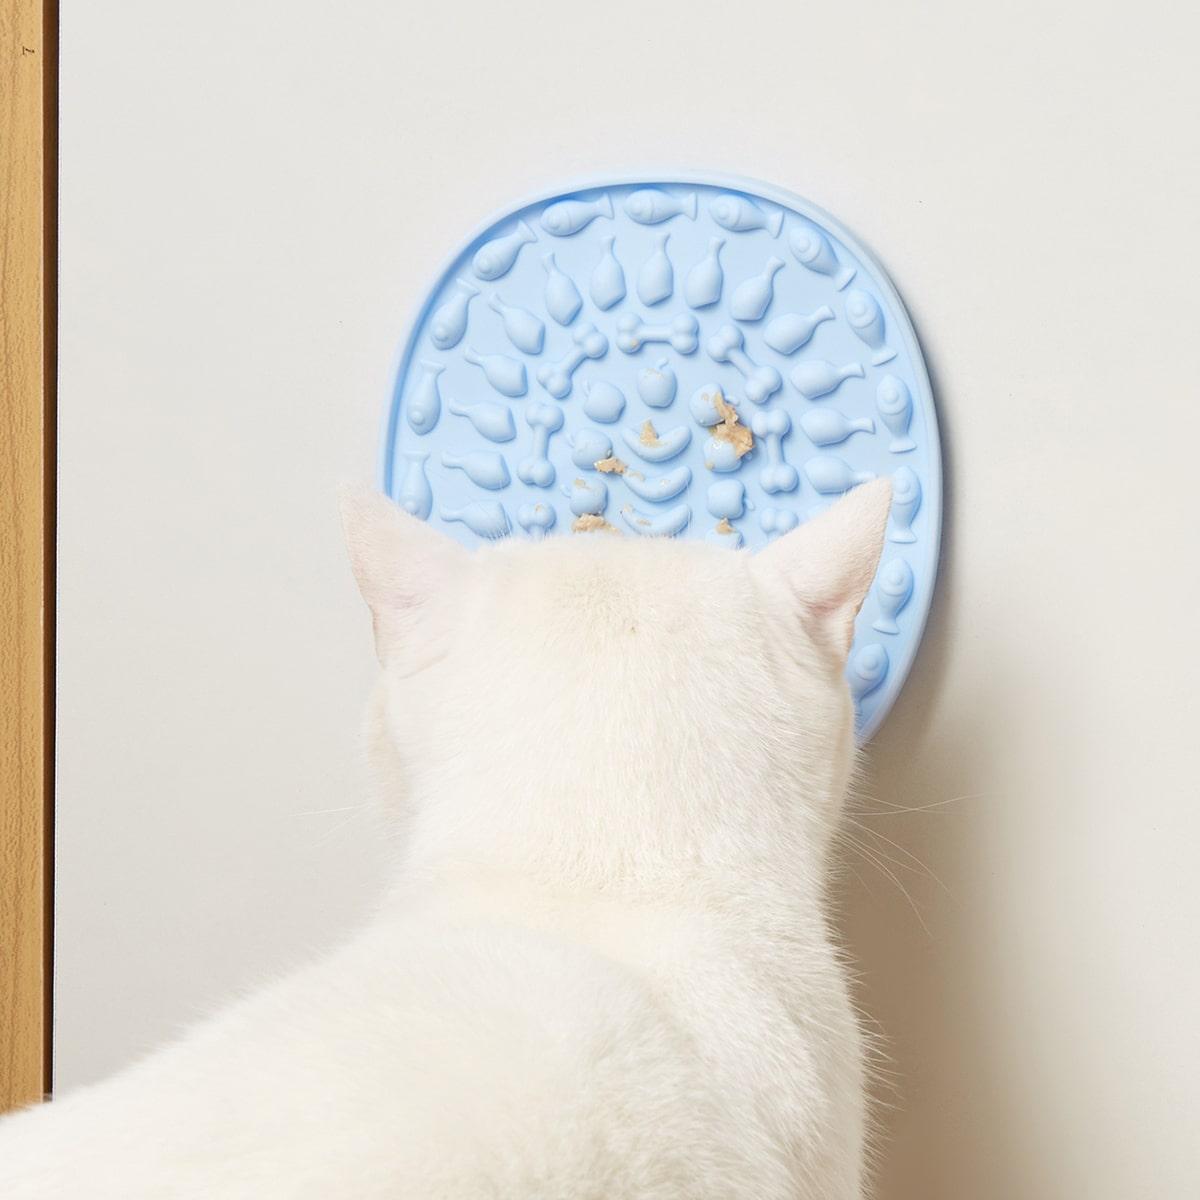 1 Stück Ovales Leck-Pad für Haustier